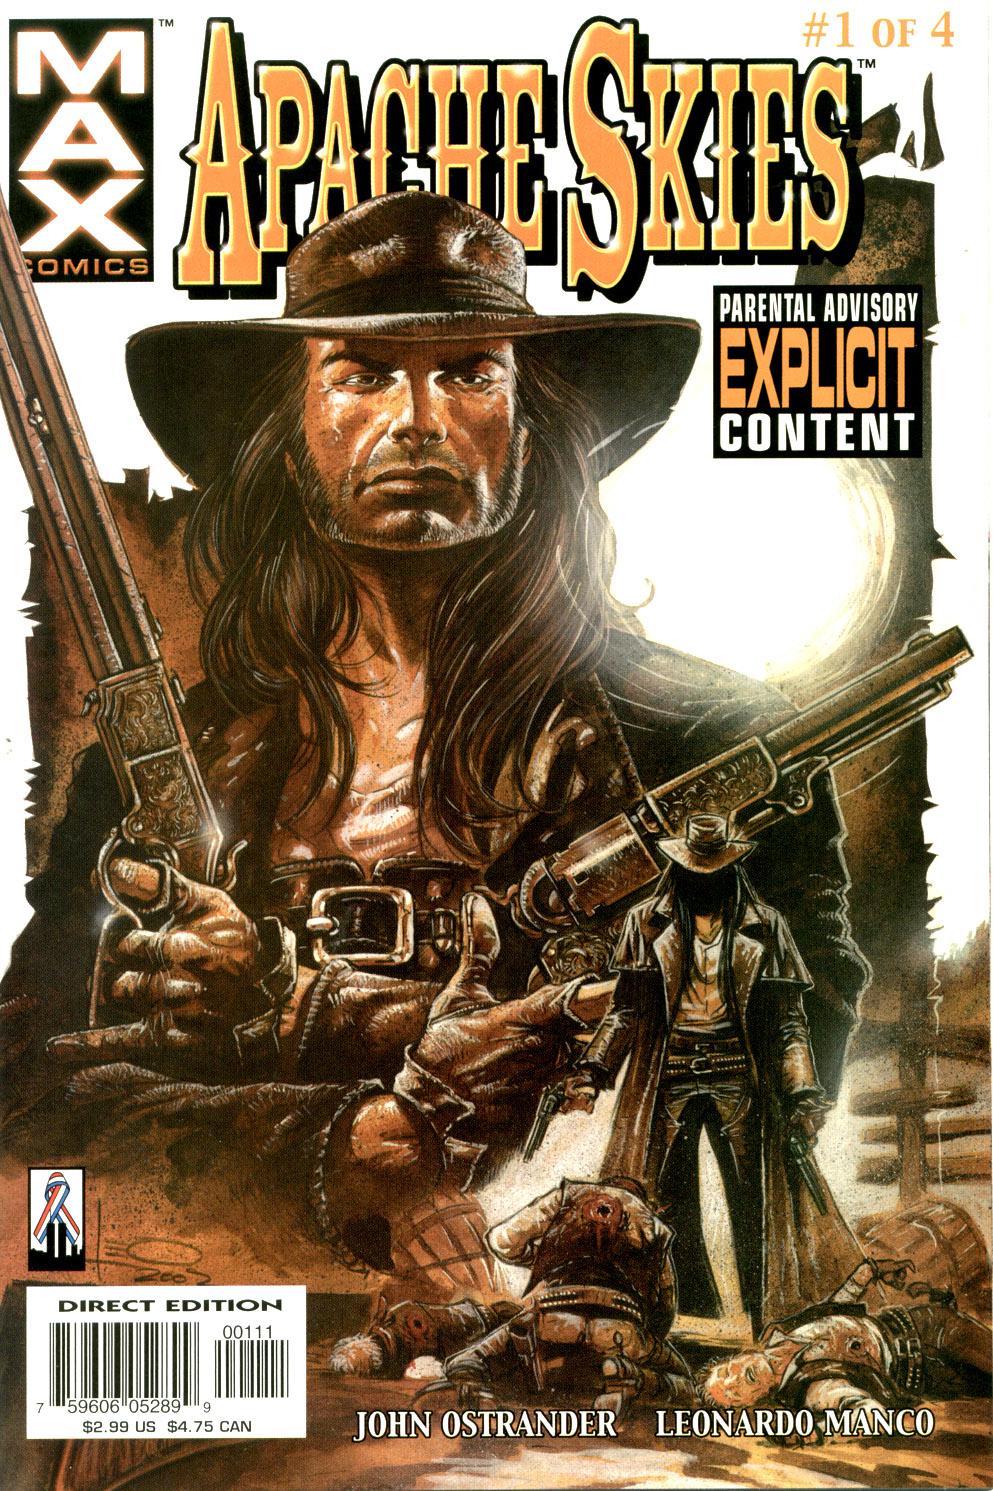 Read online Apache Skies comic -  Issue #1 - 1